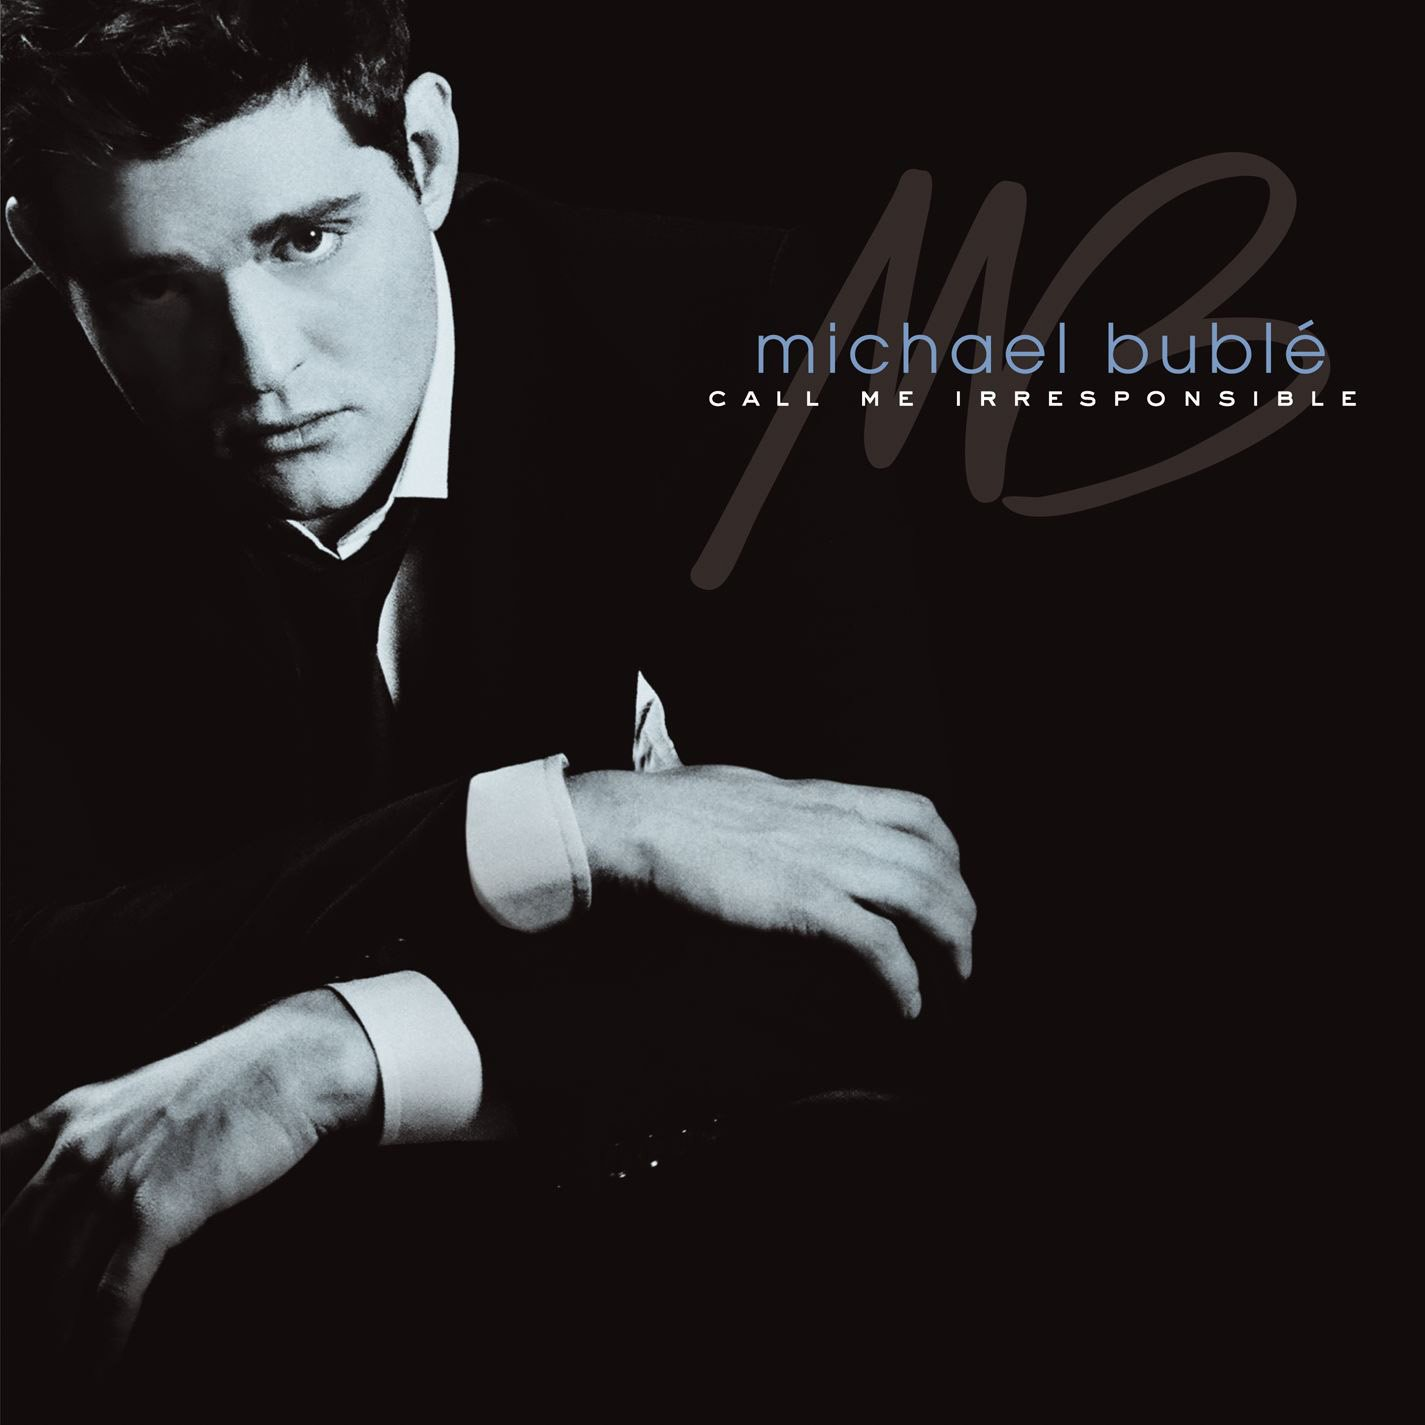 Vinilo : Michael Buble - Call Me Irresponsible (2PC)